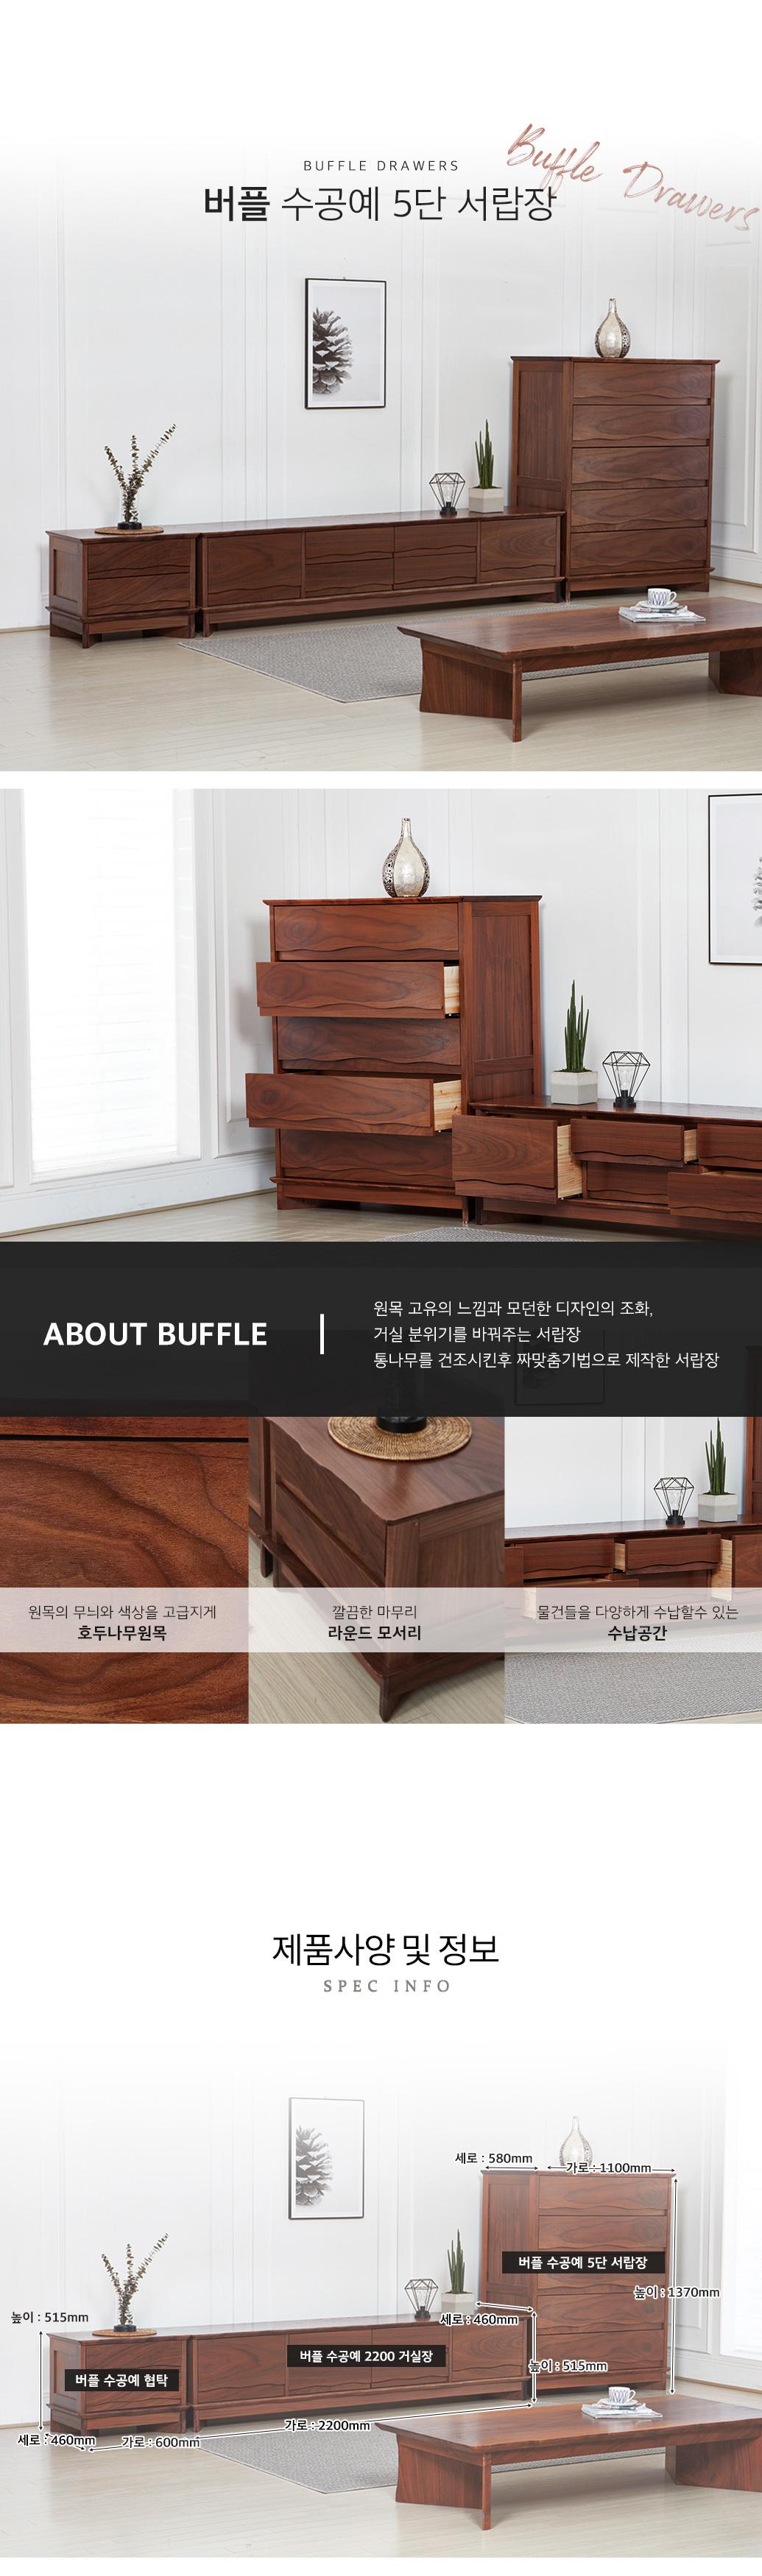 Buffle_drawers_01.jpg